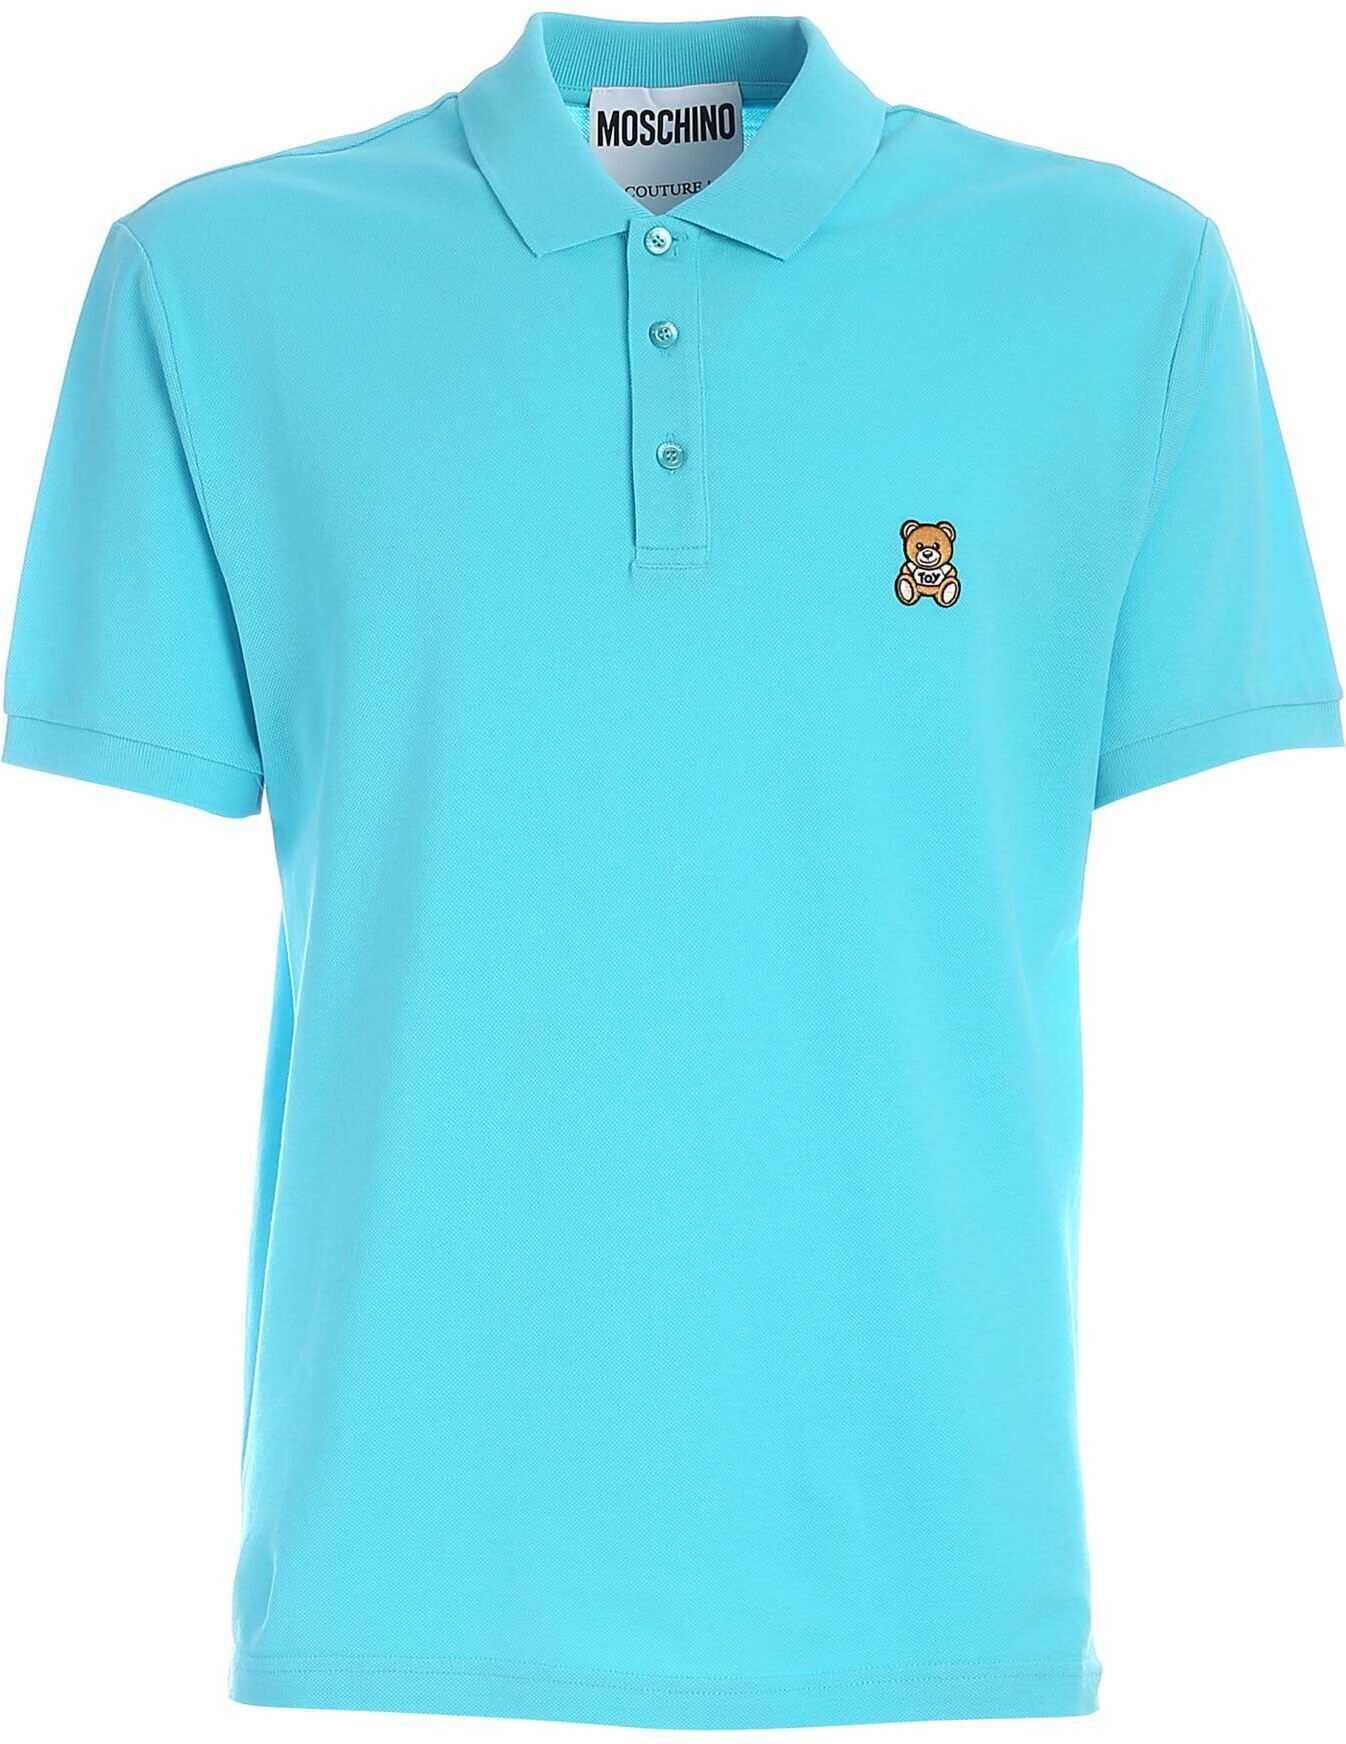 Moschino Teddy Bear Patch Polo Shirt In Light Blue Light Blue imagine